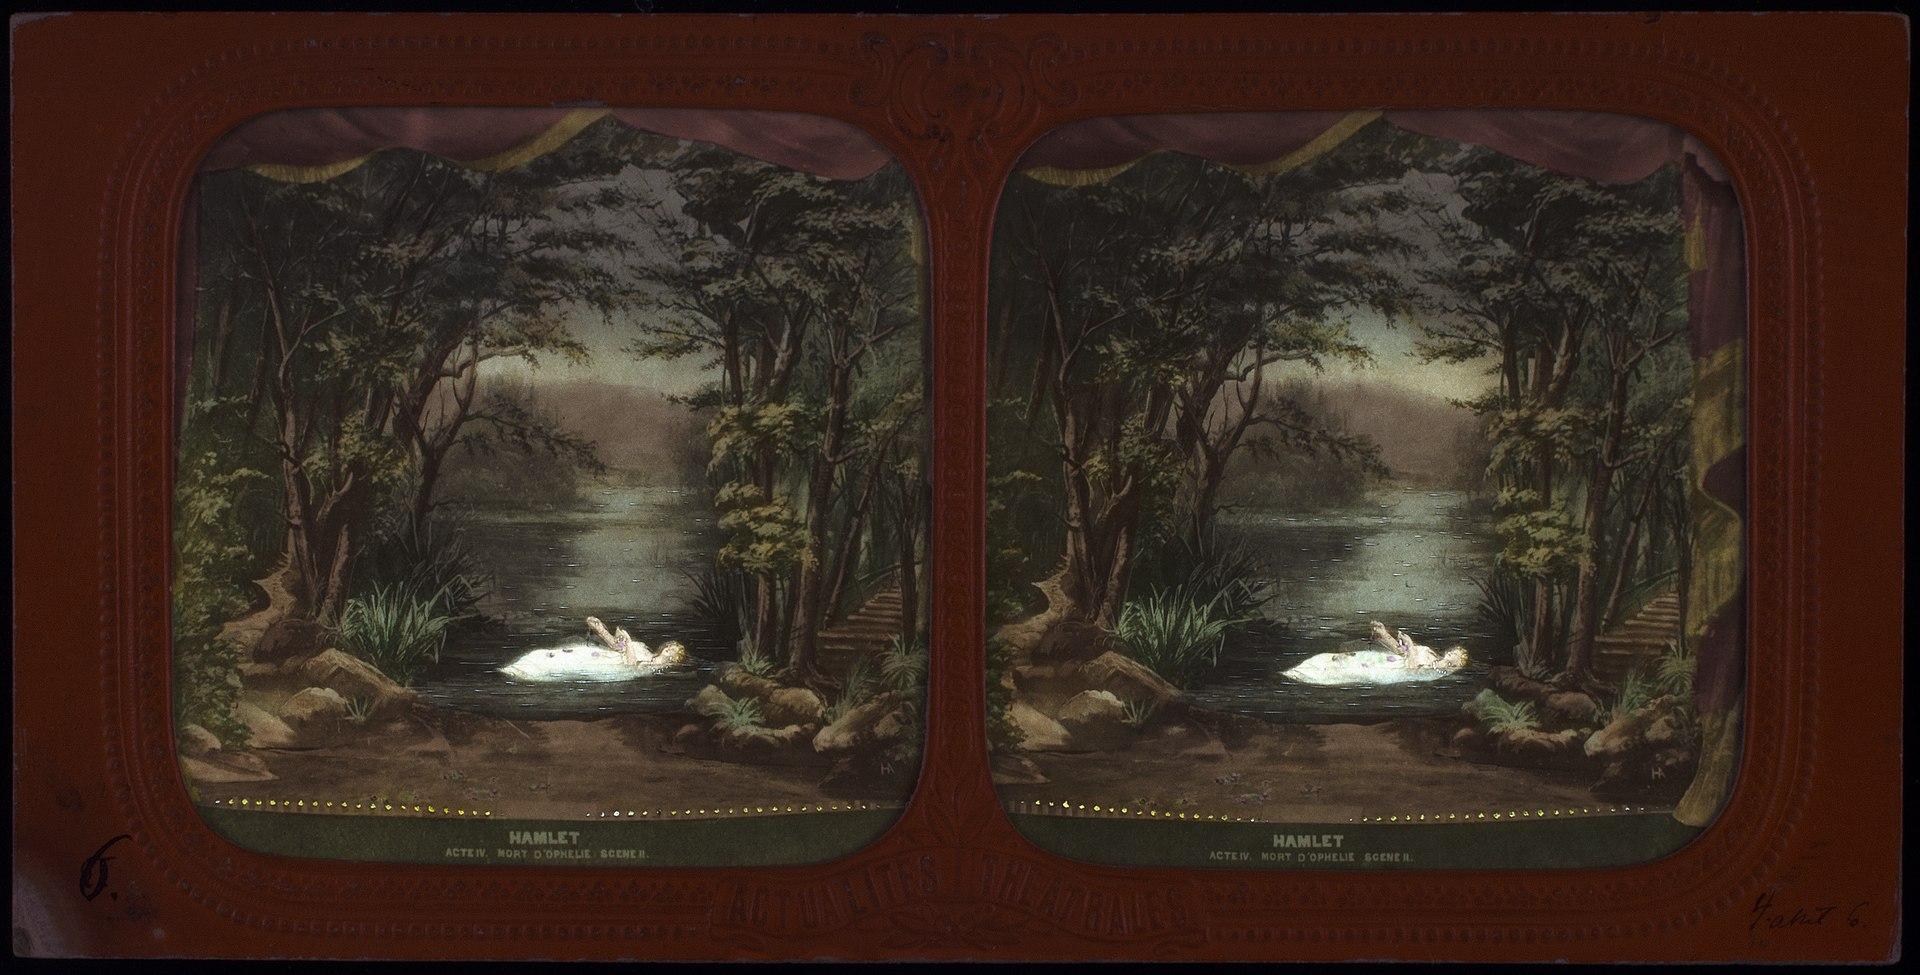 lossy-page1-1920px-Stereokort,_Hamlet_6,_acte_IV,_scène_II_-_SMV_-_S48b.tif.jpg